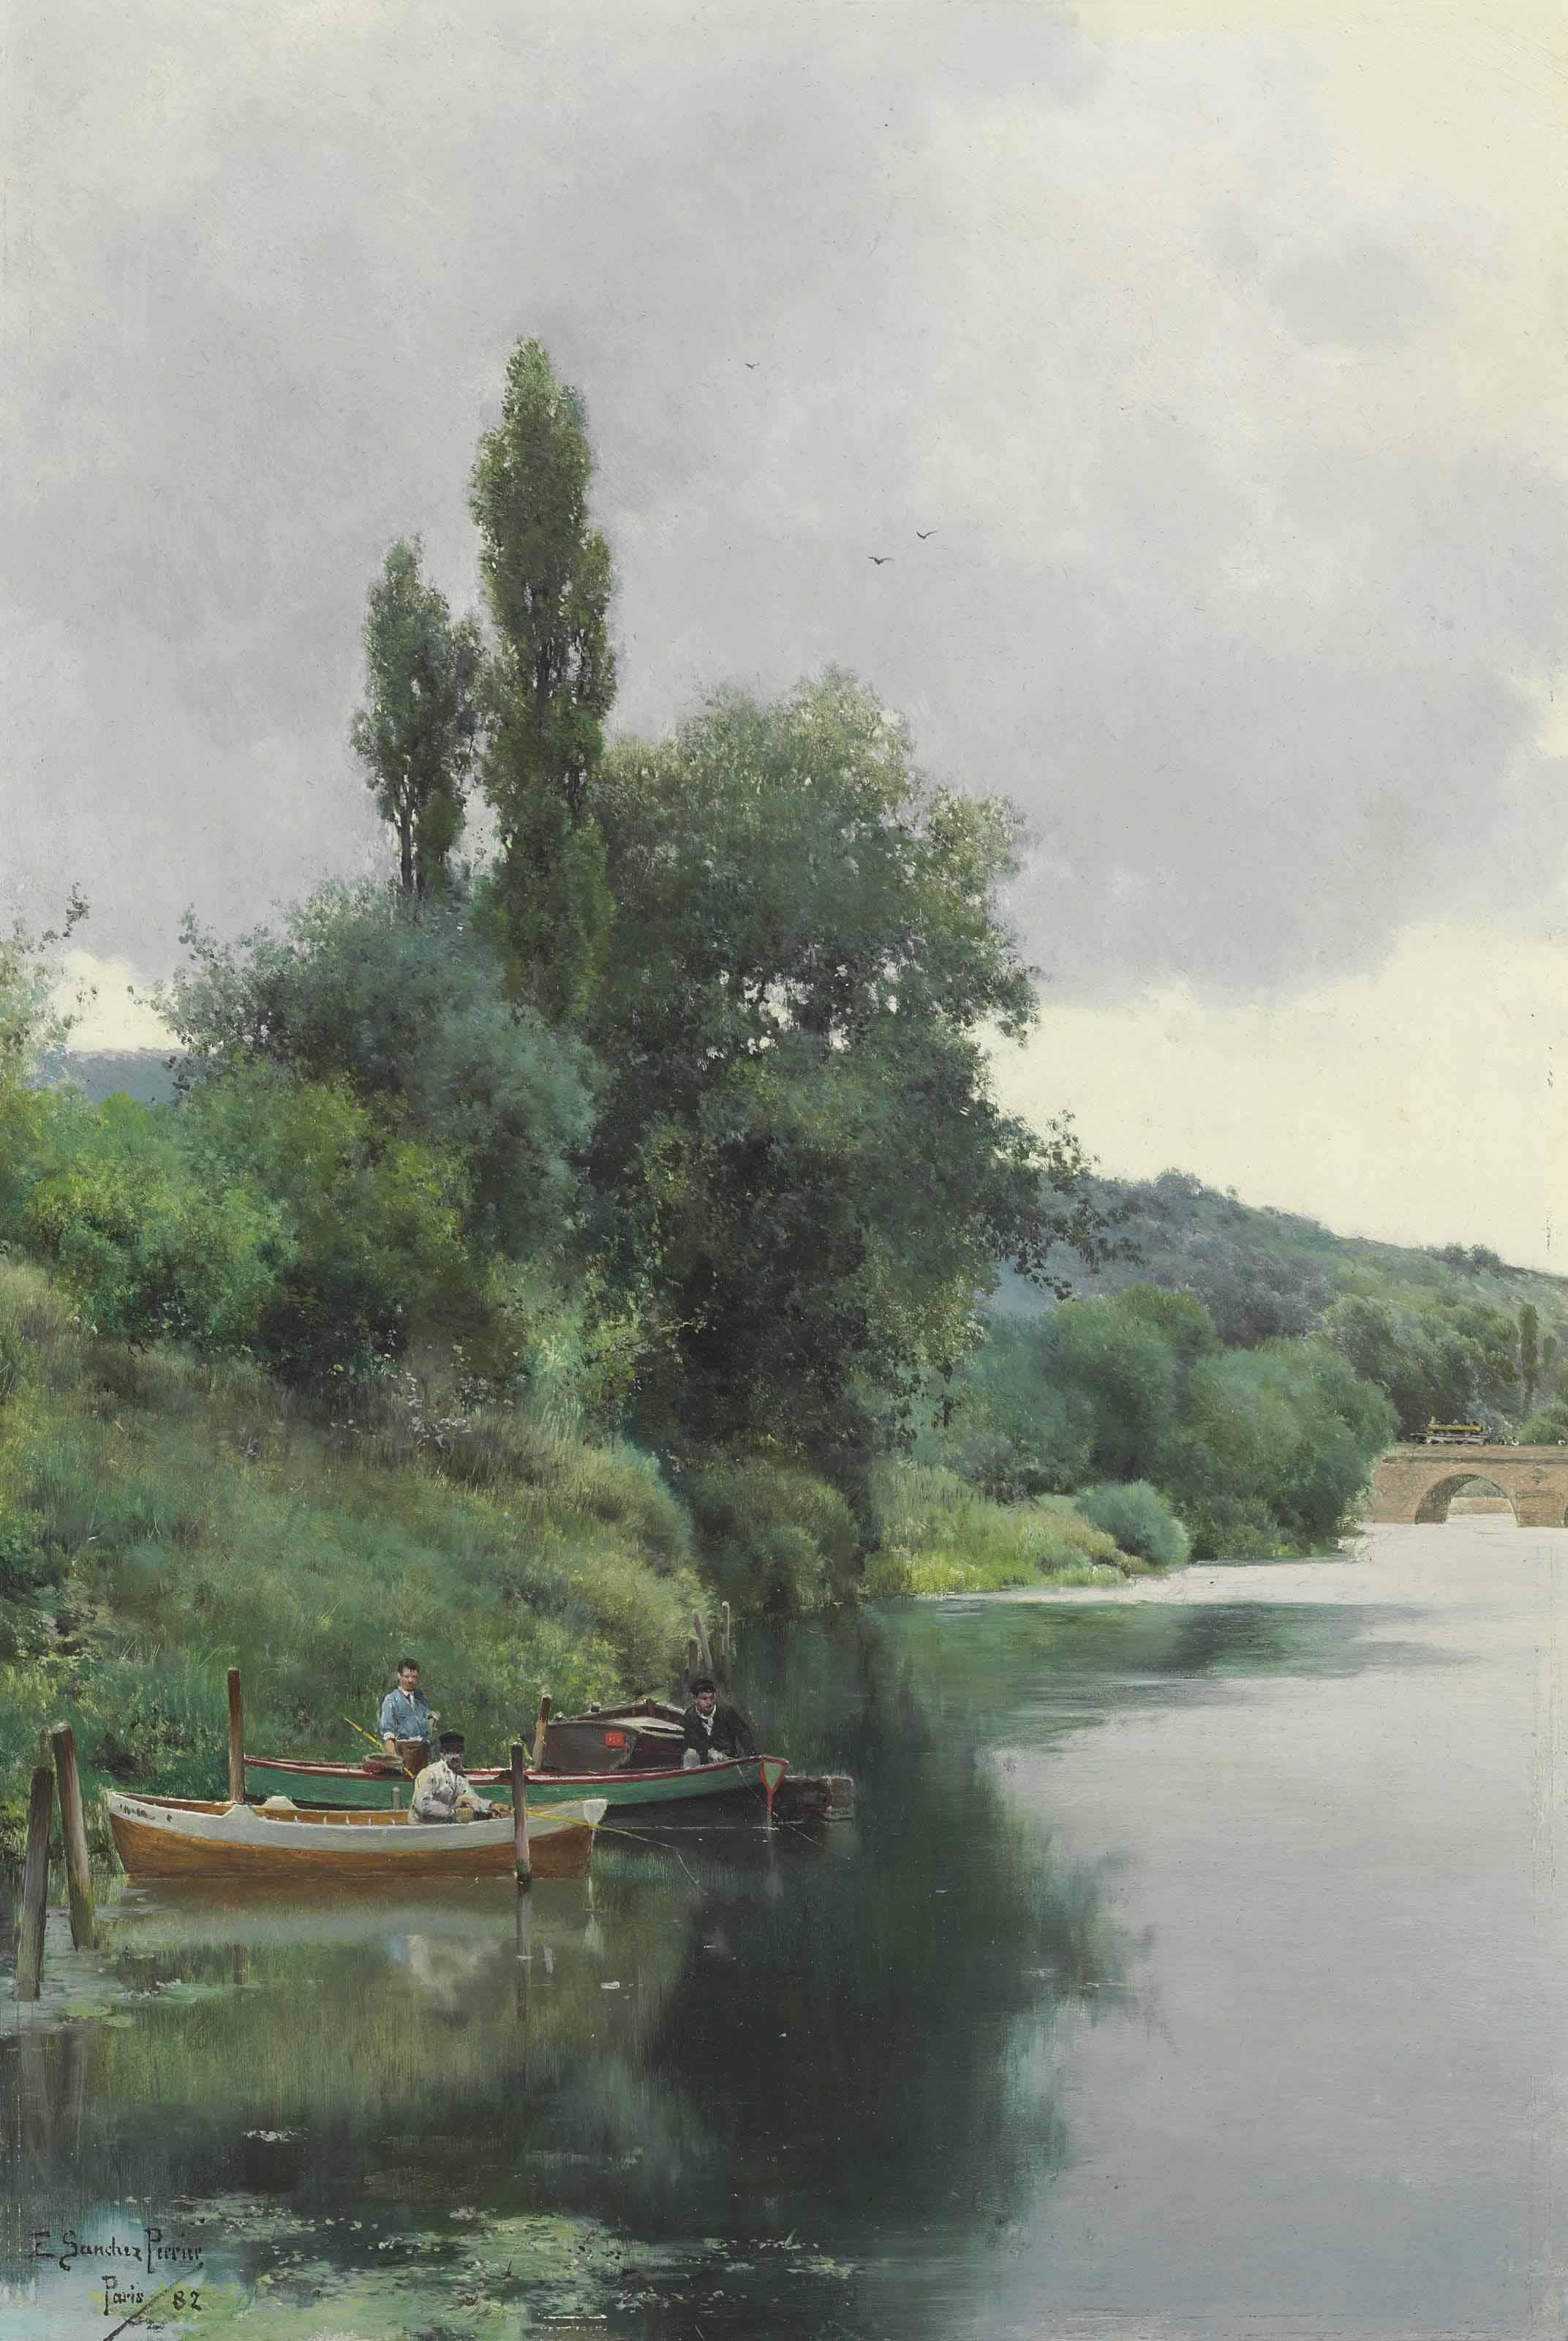 Three Men Fishing on a River